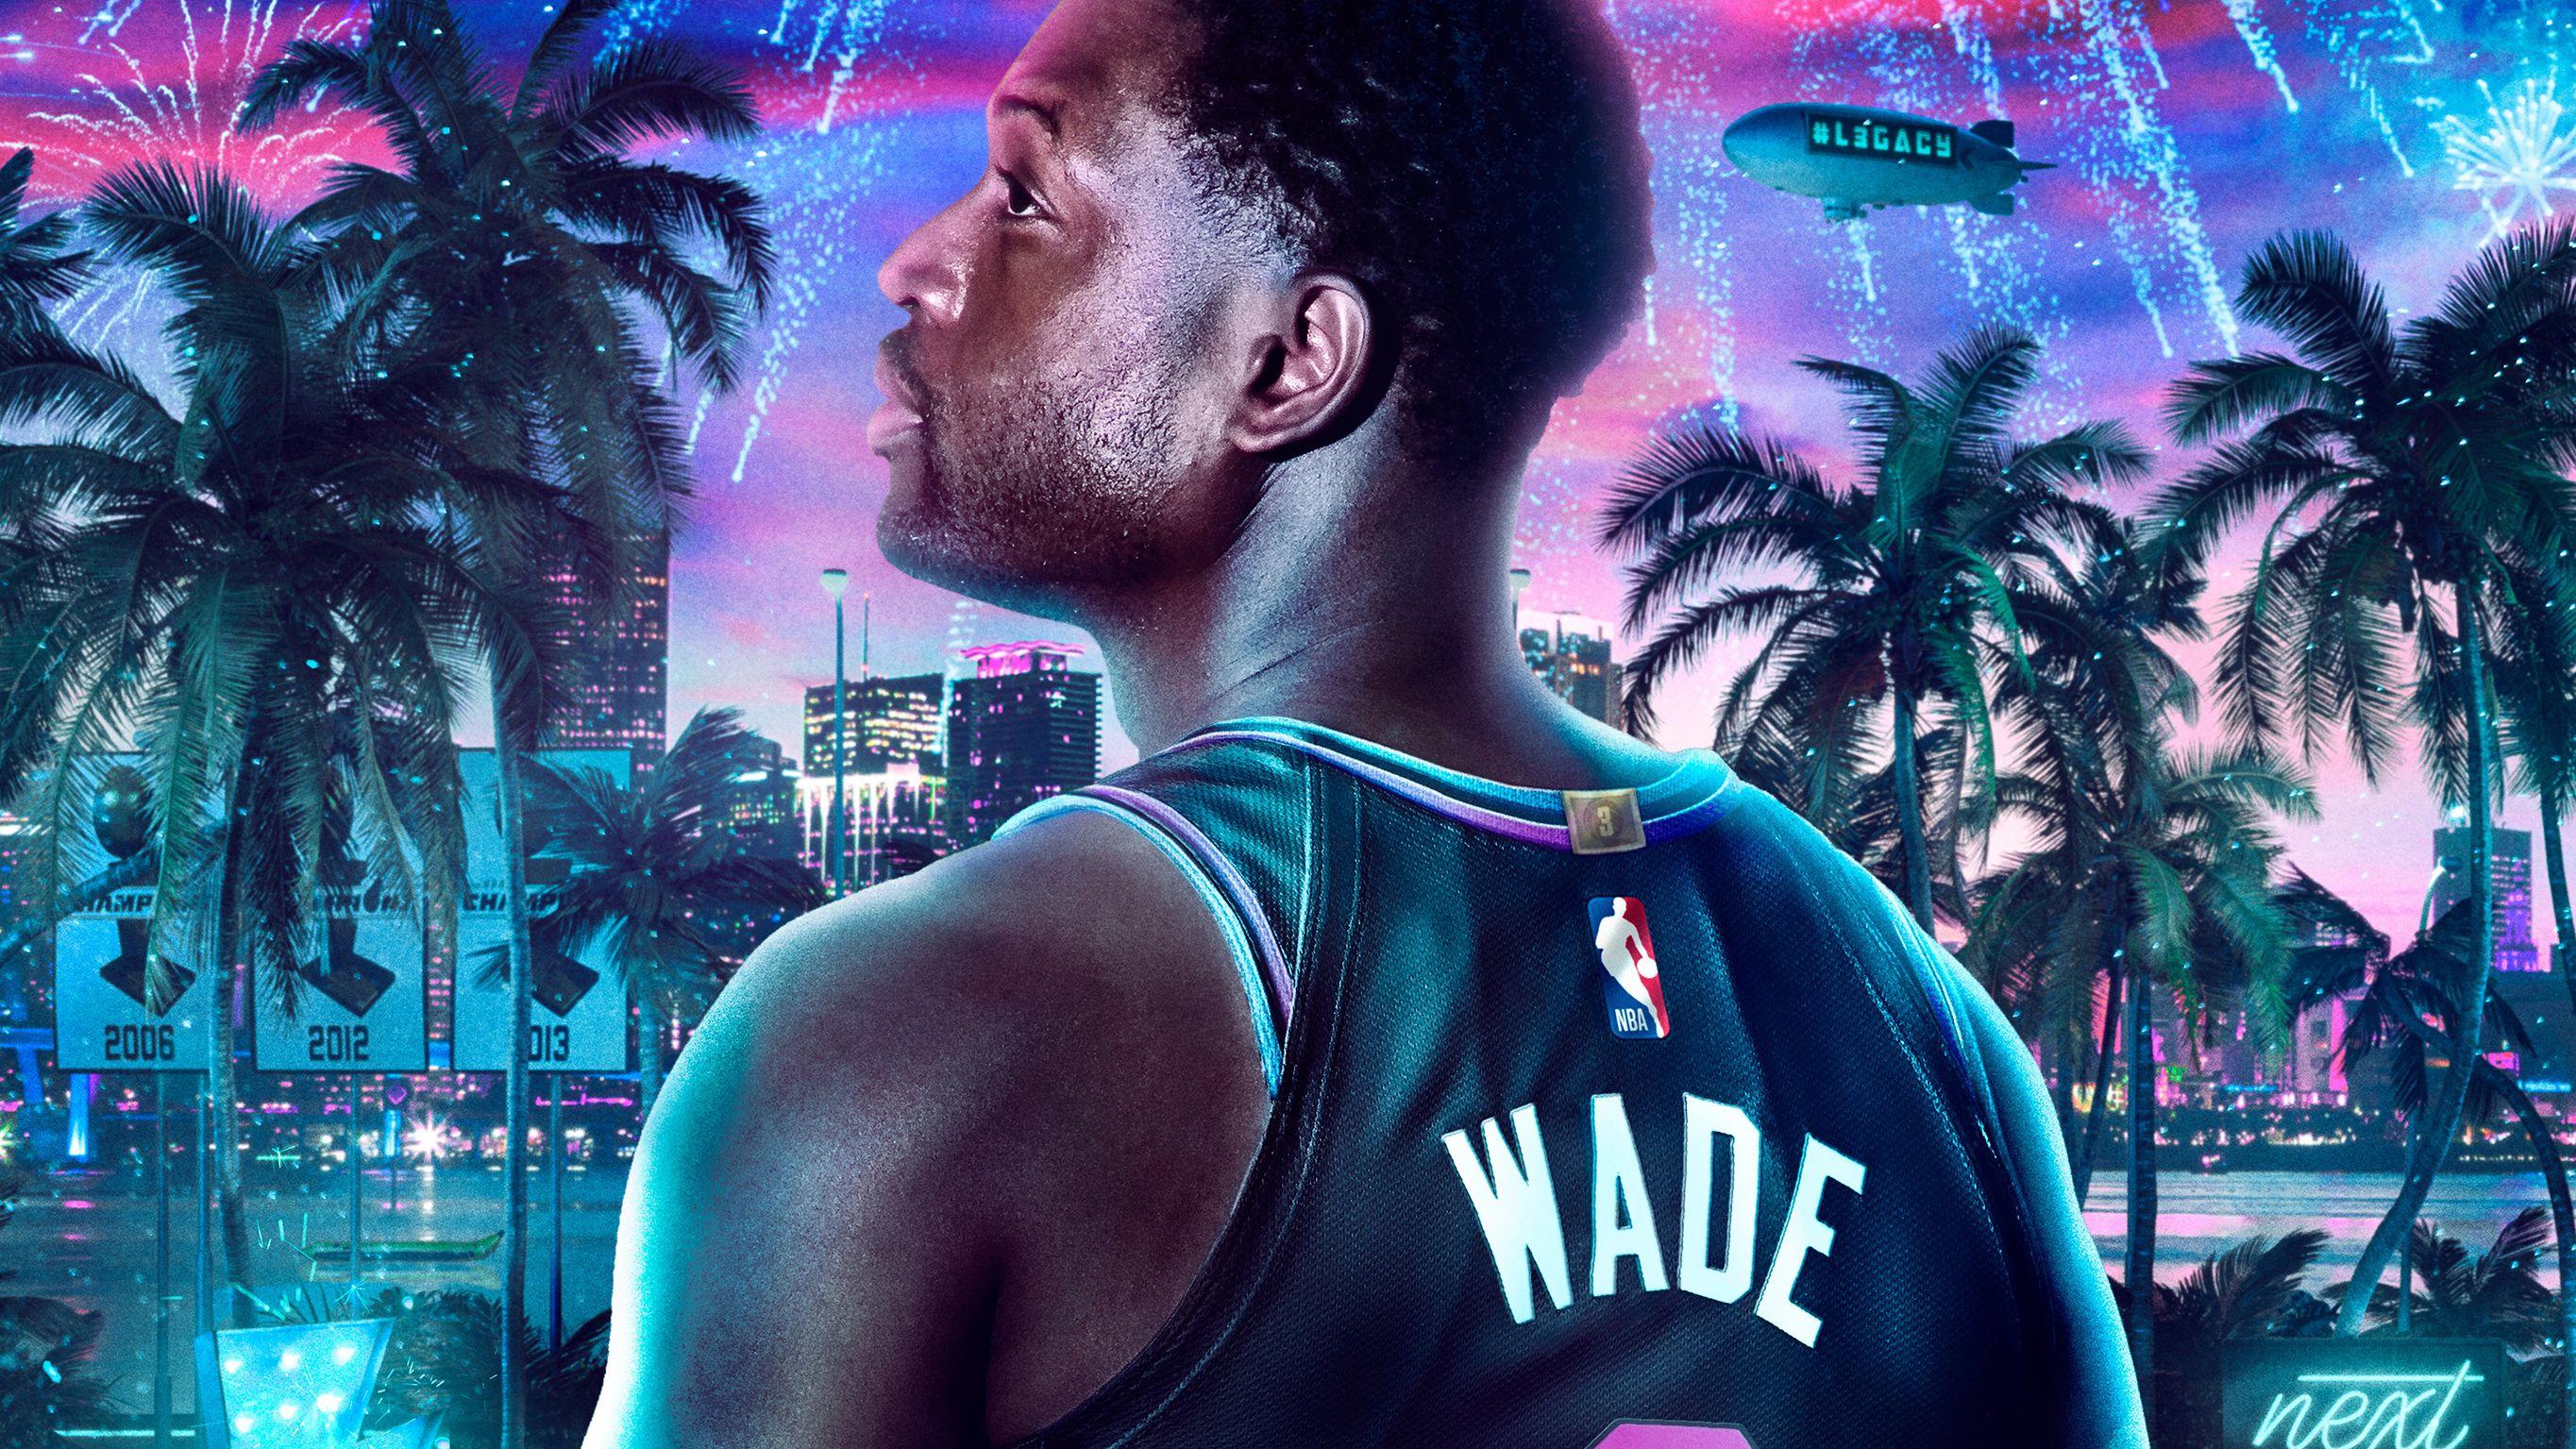 30] NBA 2k20 Wallpapers on WallpaperSafari 2729x1535